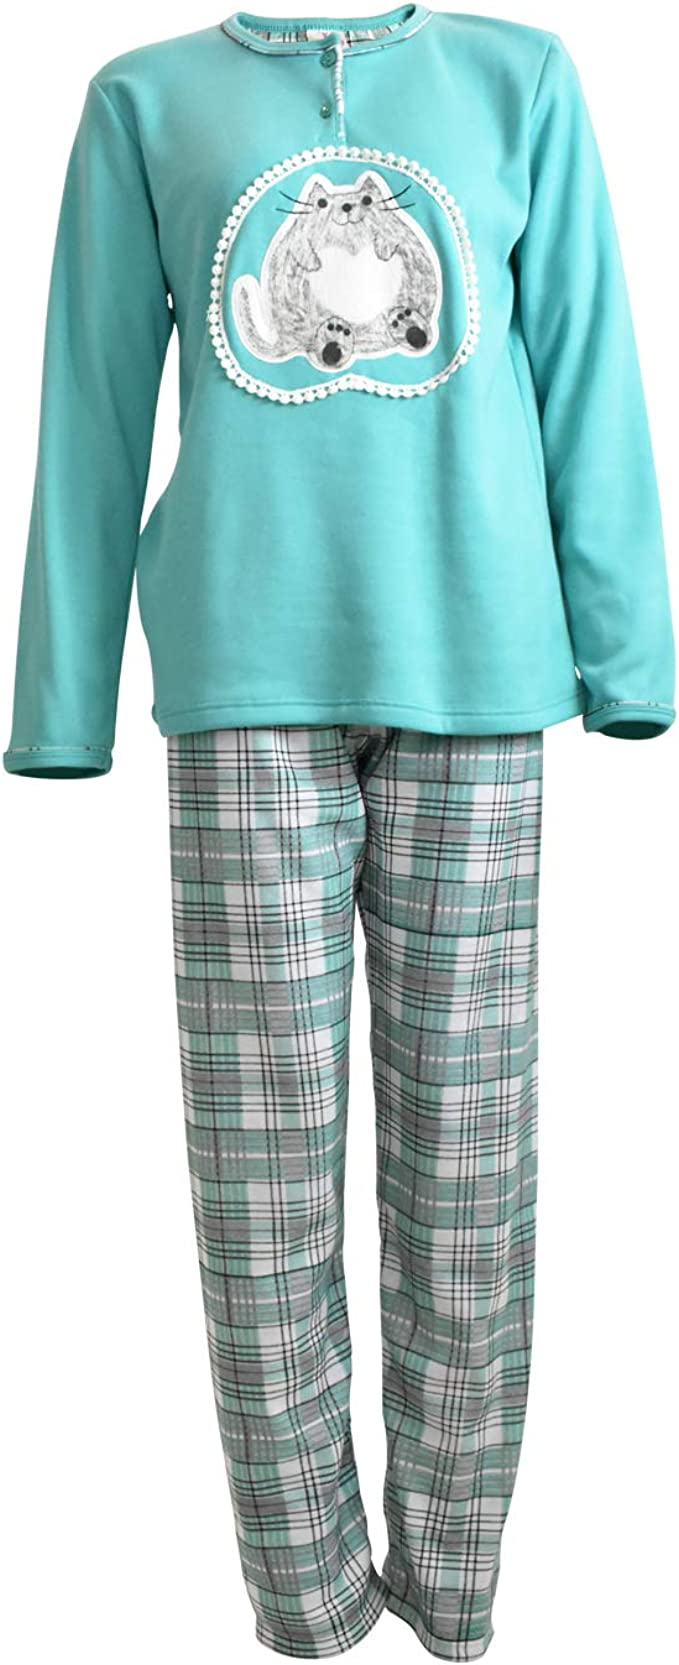 Mini kitten - Pijama de Mujer de Algodón Calido de Conjuntos Largo ...